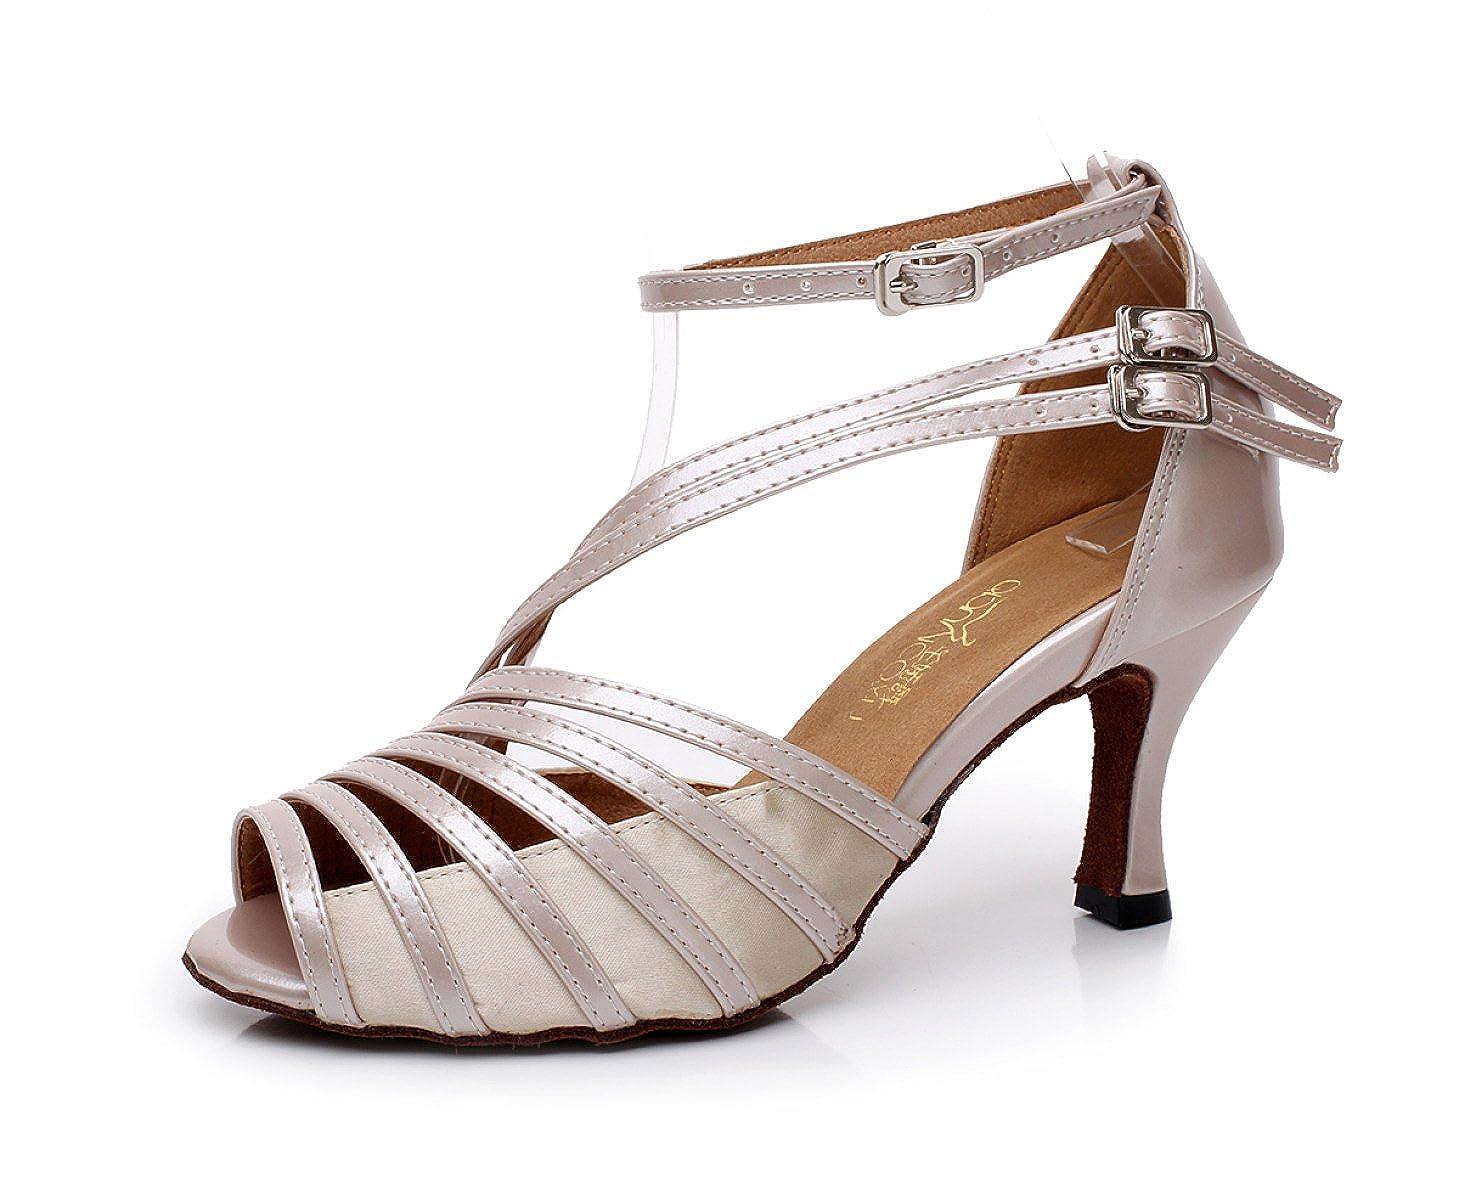 JSHOE Chaussures De Danse Salsa Latin PU B07G49BHMR PU Chaussures Chaussures Salsa/Tango/ Thé/Samba/ Moderne/Jazz Sandales Chaussures Talons Hauts,Beige-heeled6cm-UK6/EU39/Our40 - 49a227a - piero.space